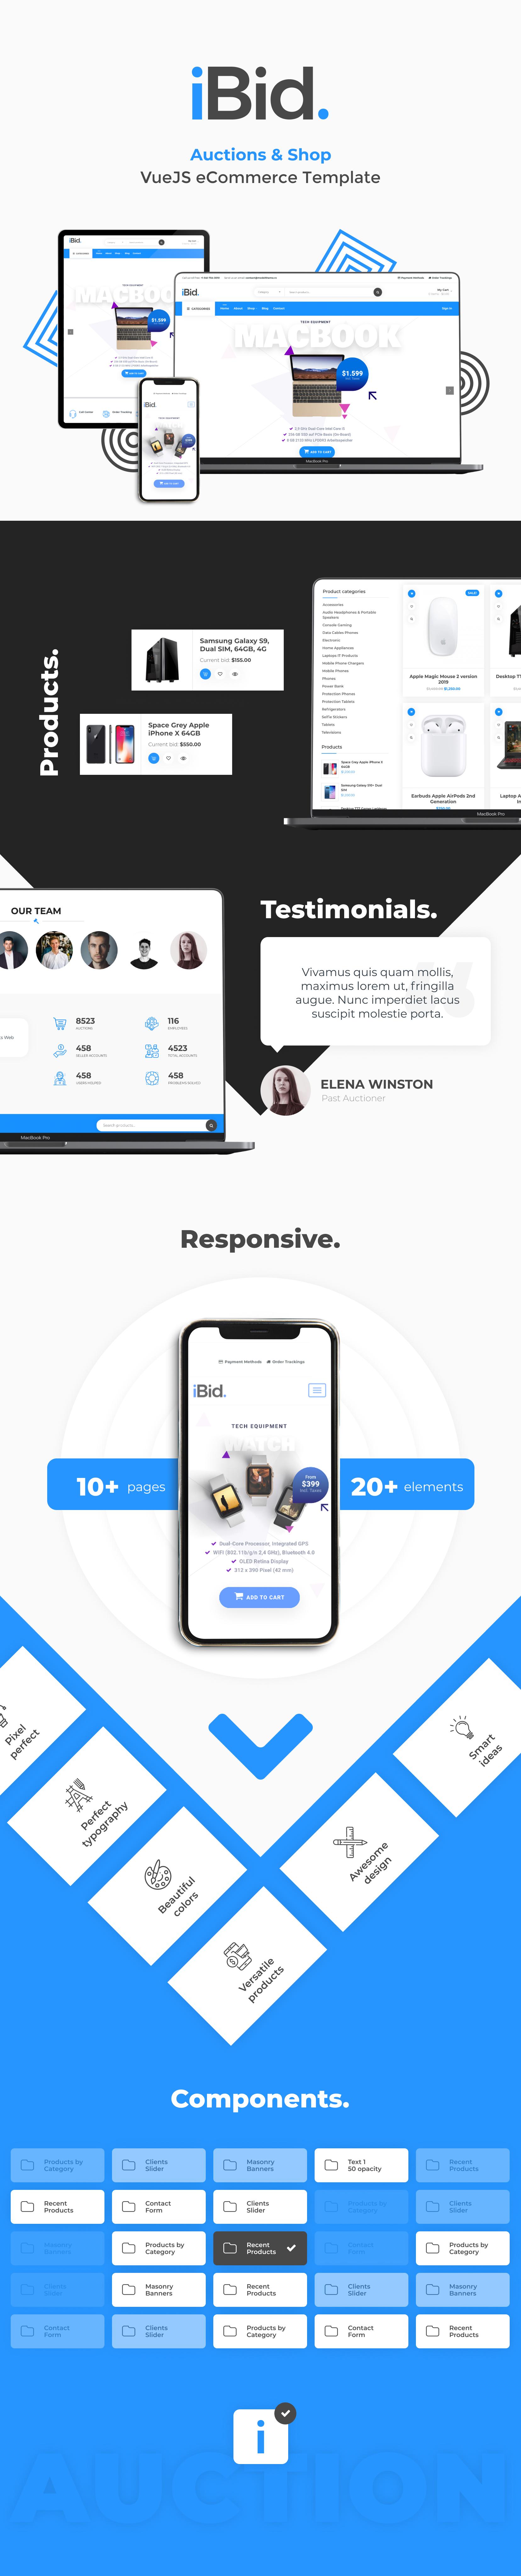 iBid - VueJS eCommerce & Auctions Template - 3